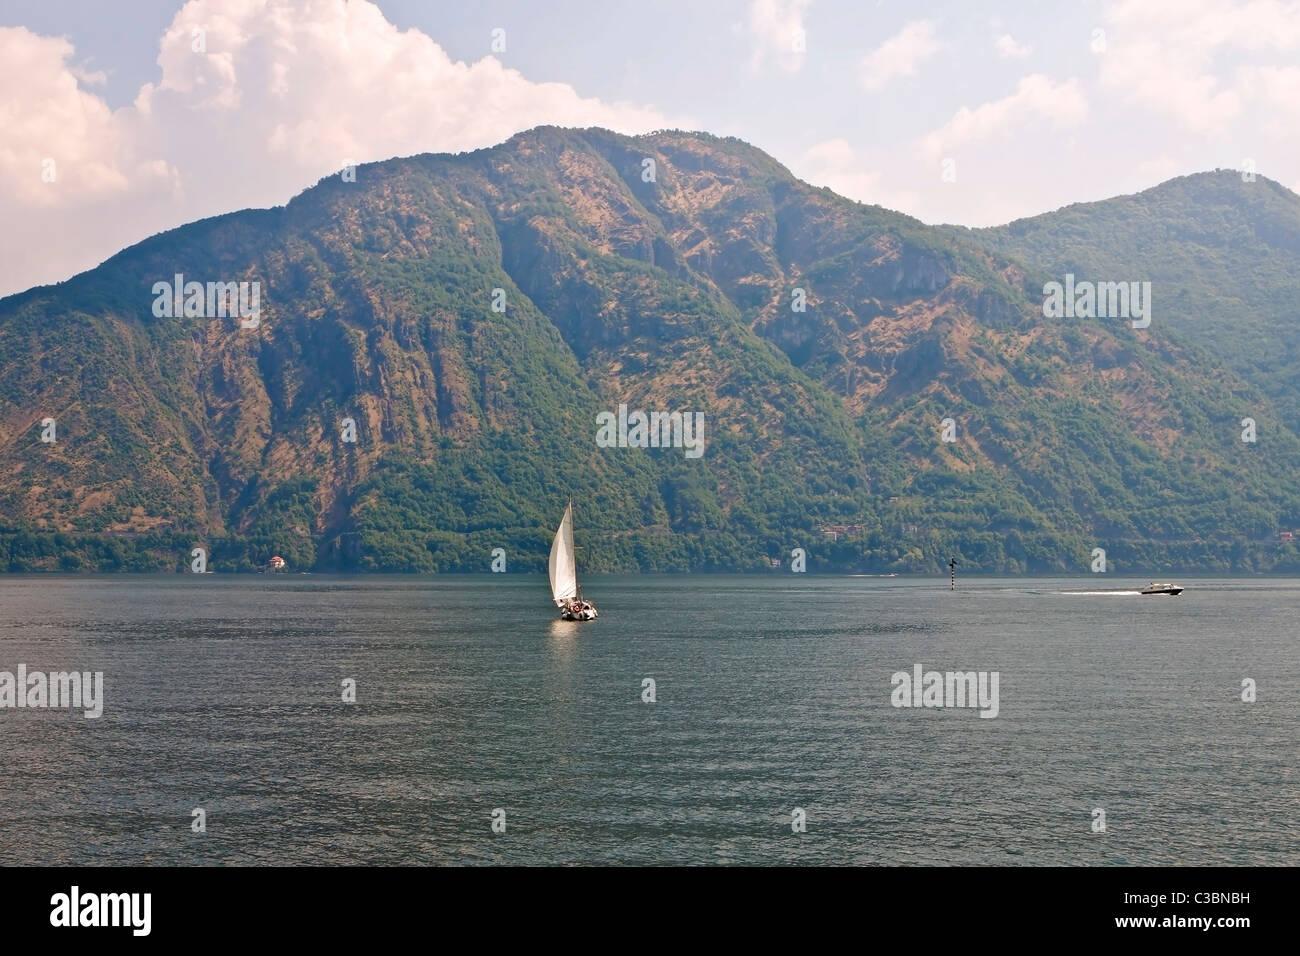 Blick auf den Lago di Como von Lenno - Stock Image